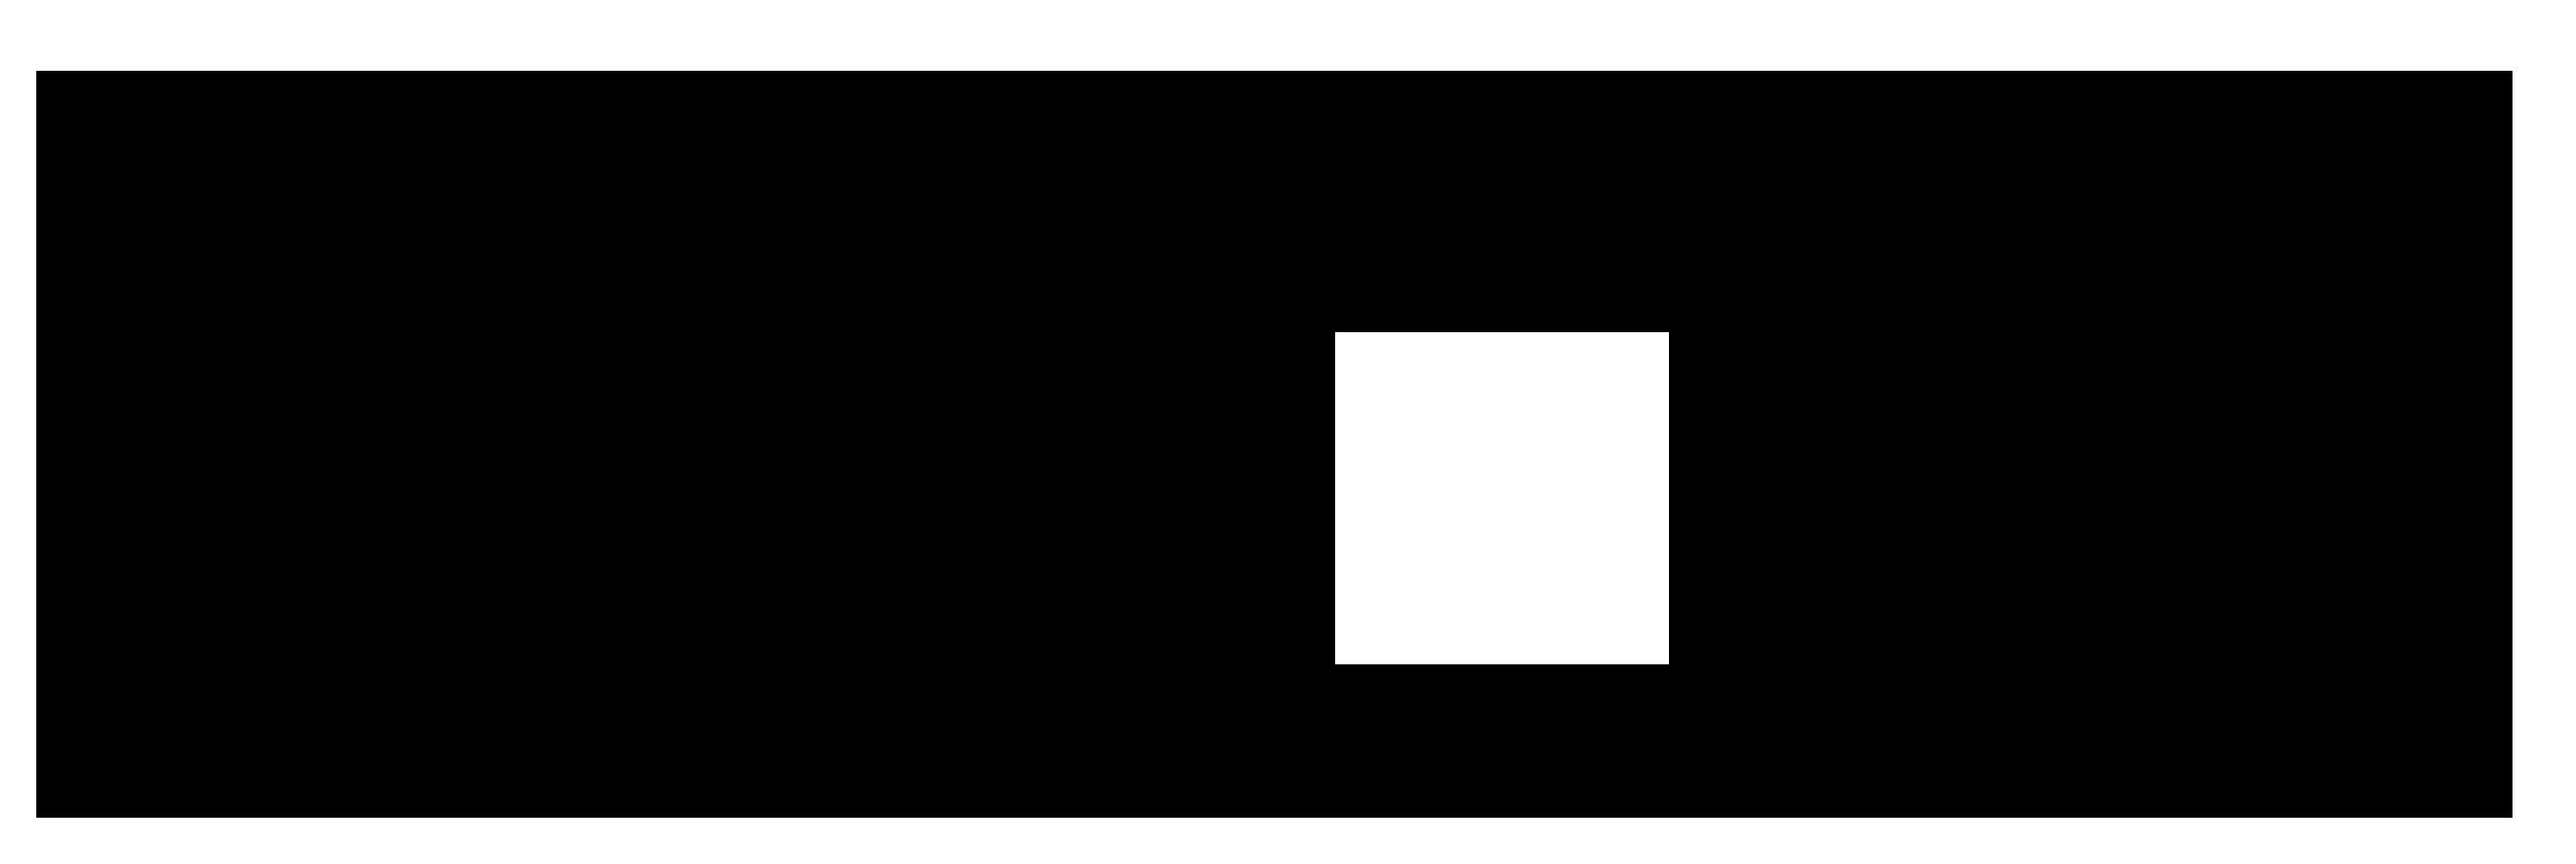 drawing of gearmotor